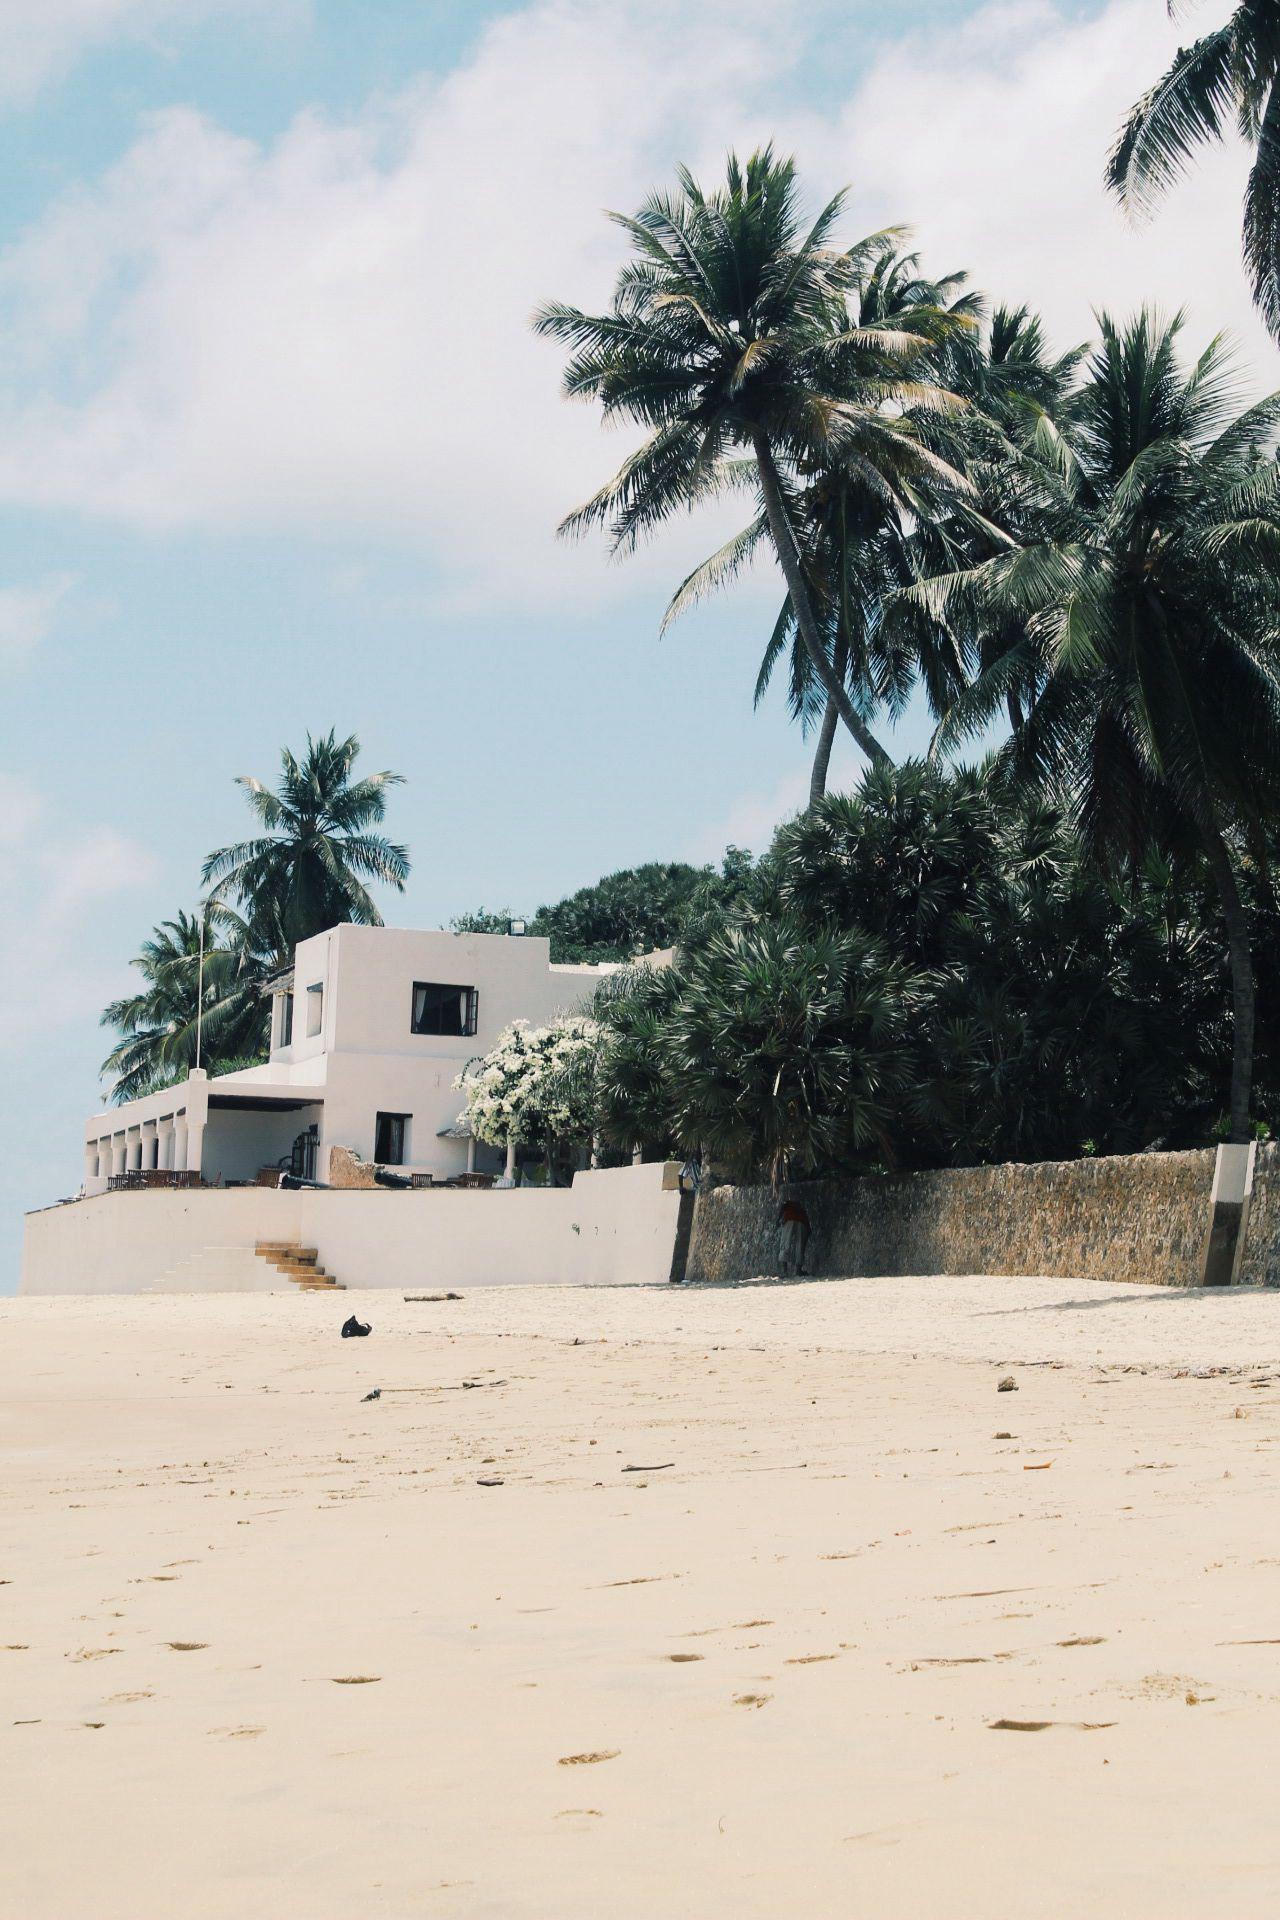 Peponi Hotel, Lamu Island #island #kenya #africa Photo: SB